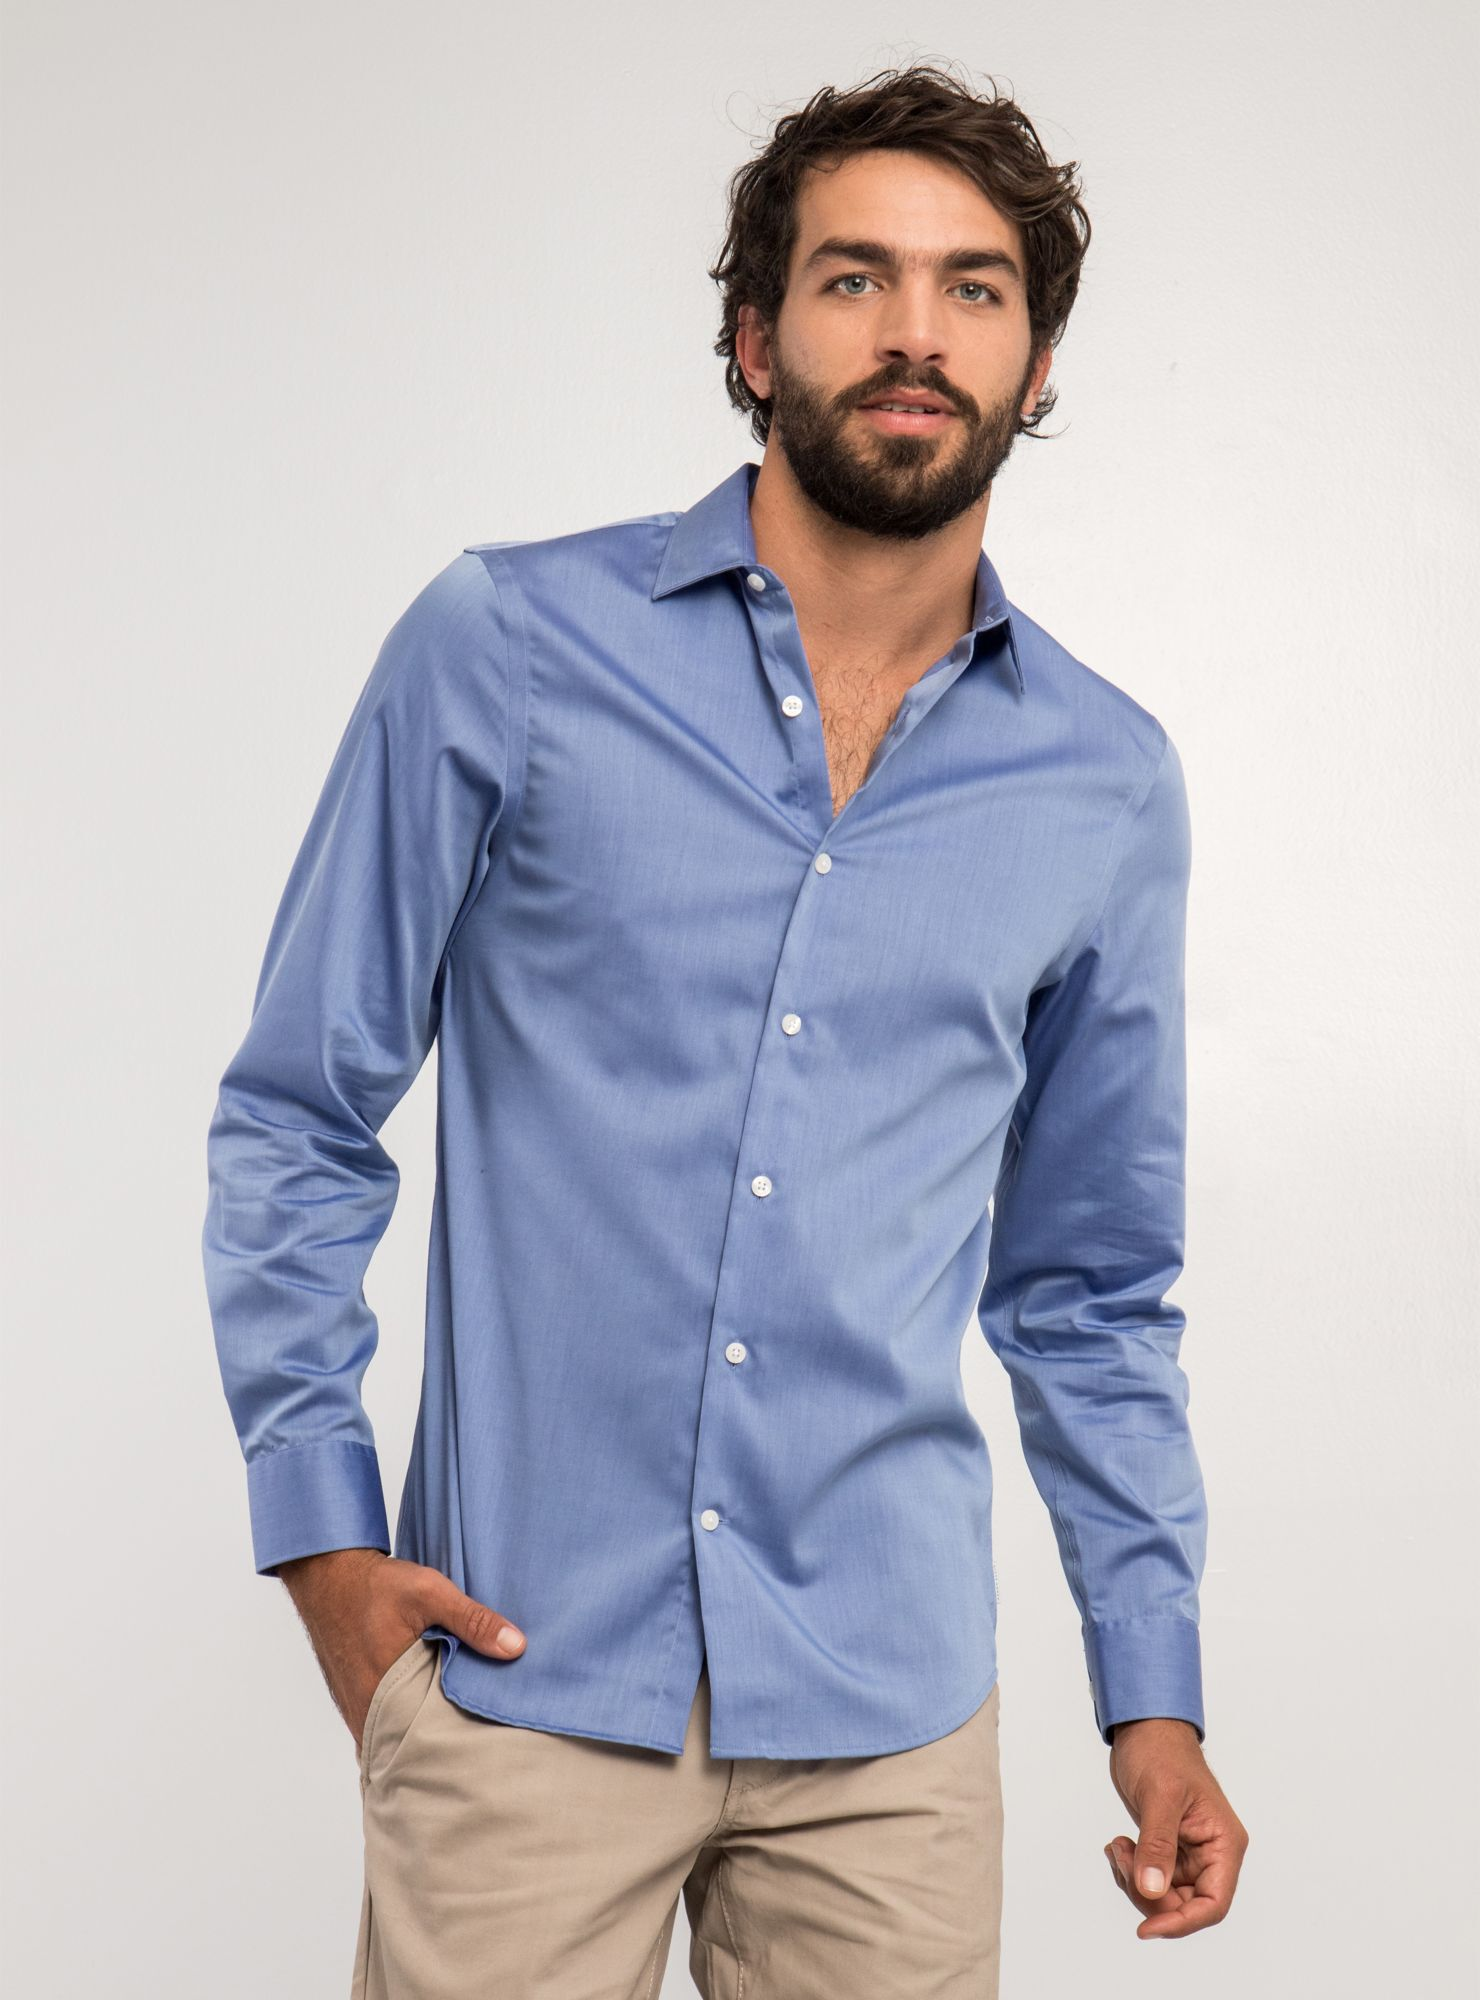 16b474c7c6 Hombre Moda Hombre Camisas Camisa Non Iron Perry Ellis. Camisa%20Non%20Iron%20Perry%20Ellis%2CCeleste%2Chi-res  ...